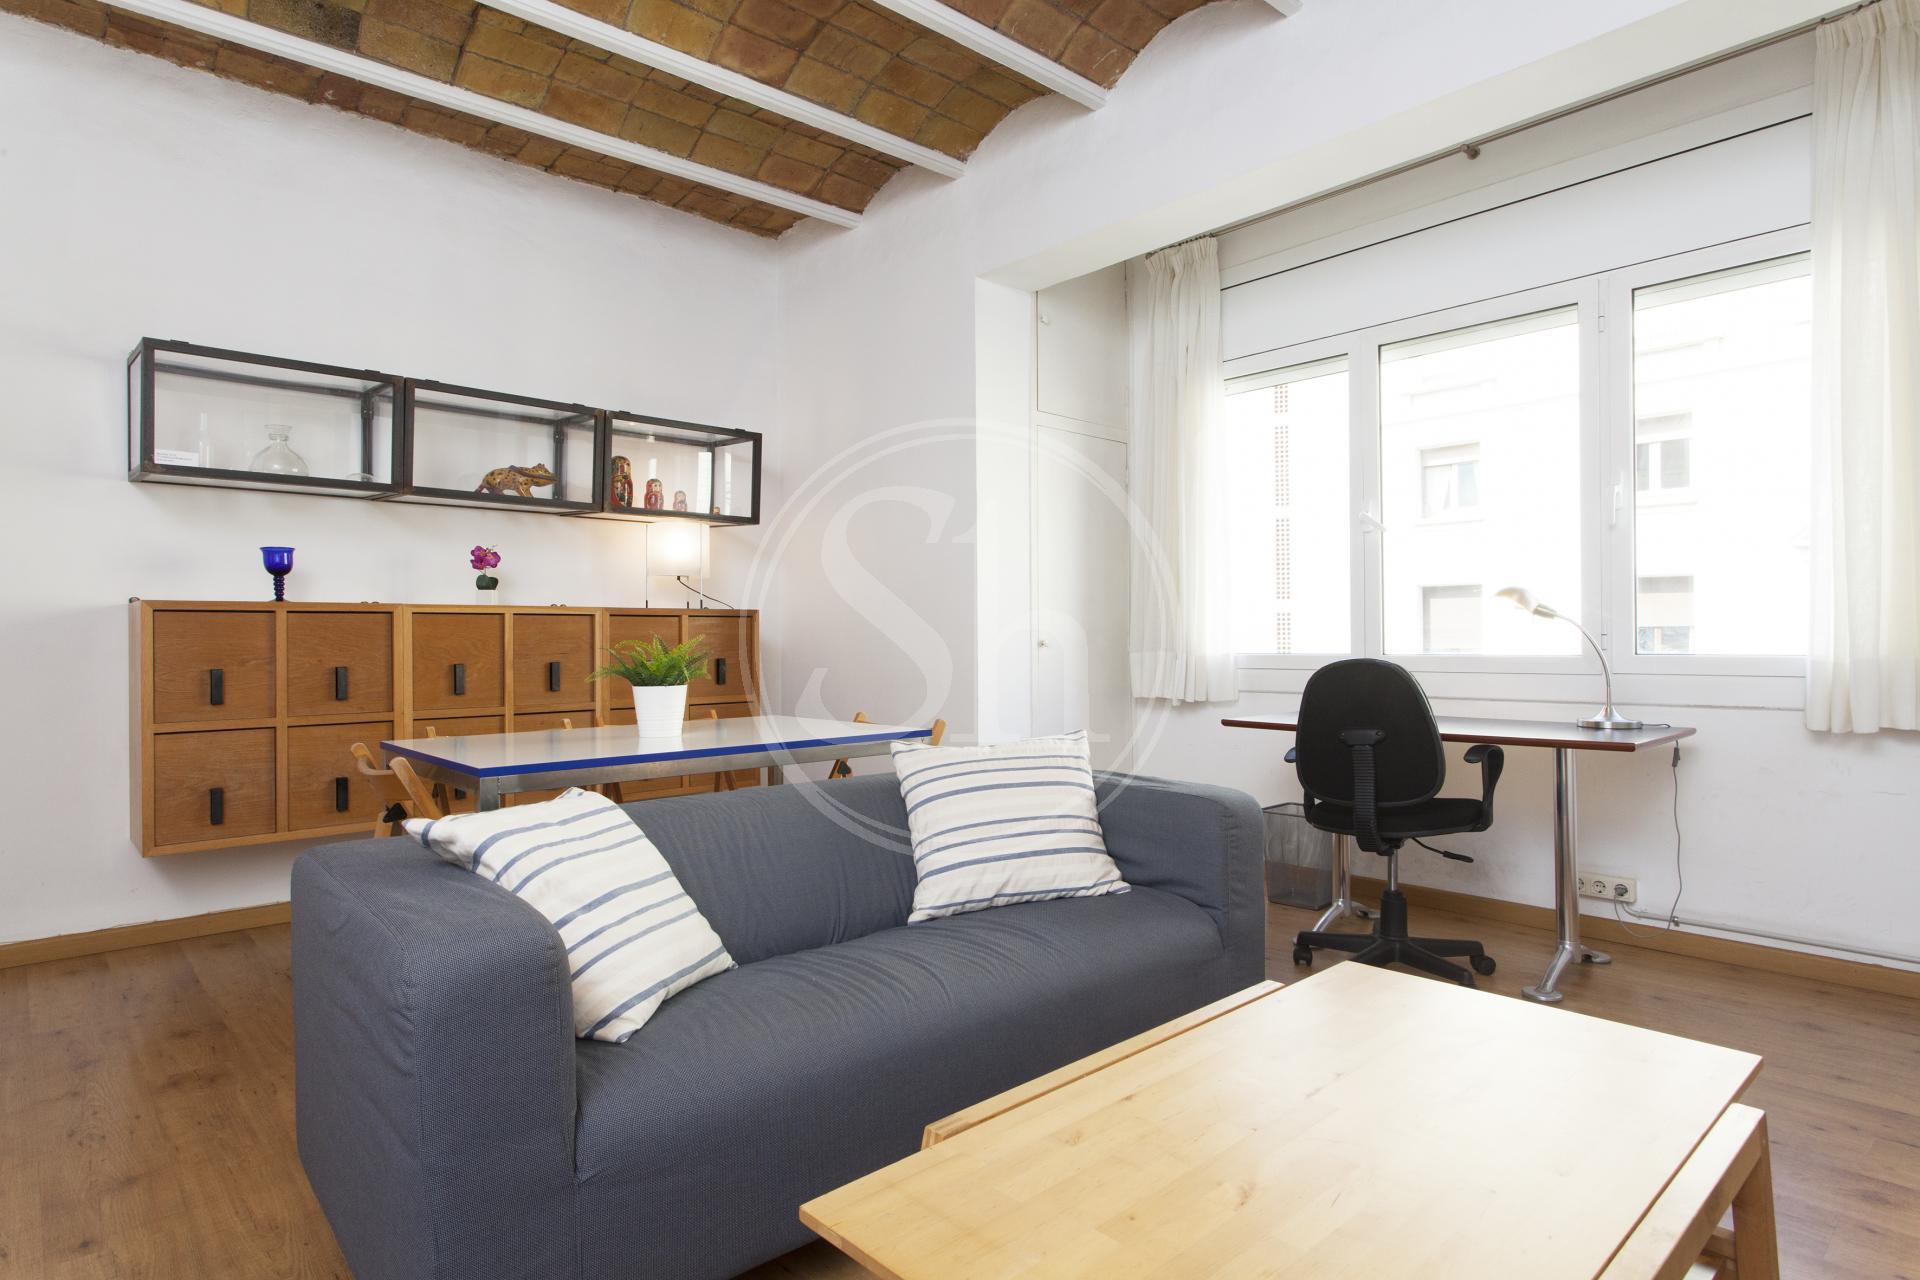 shbarcelona loft meubl eixample dreta casanova barcelone. Black Bedroom Furniture Sets. Home Design Ideas